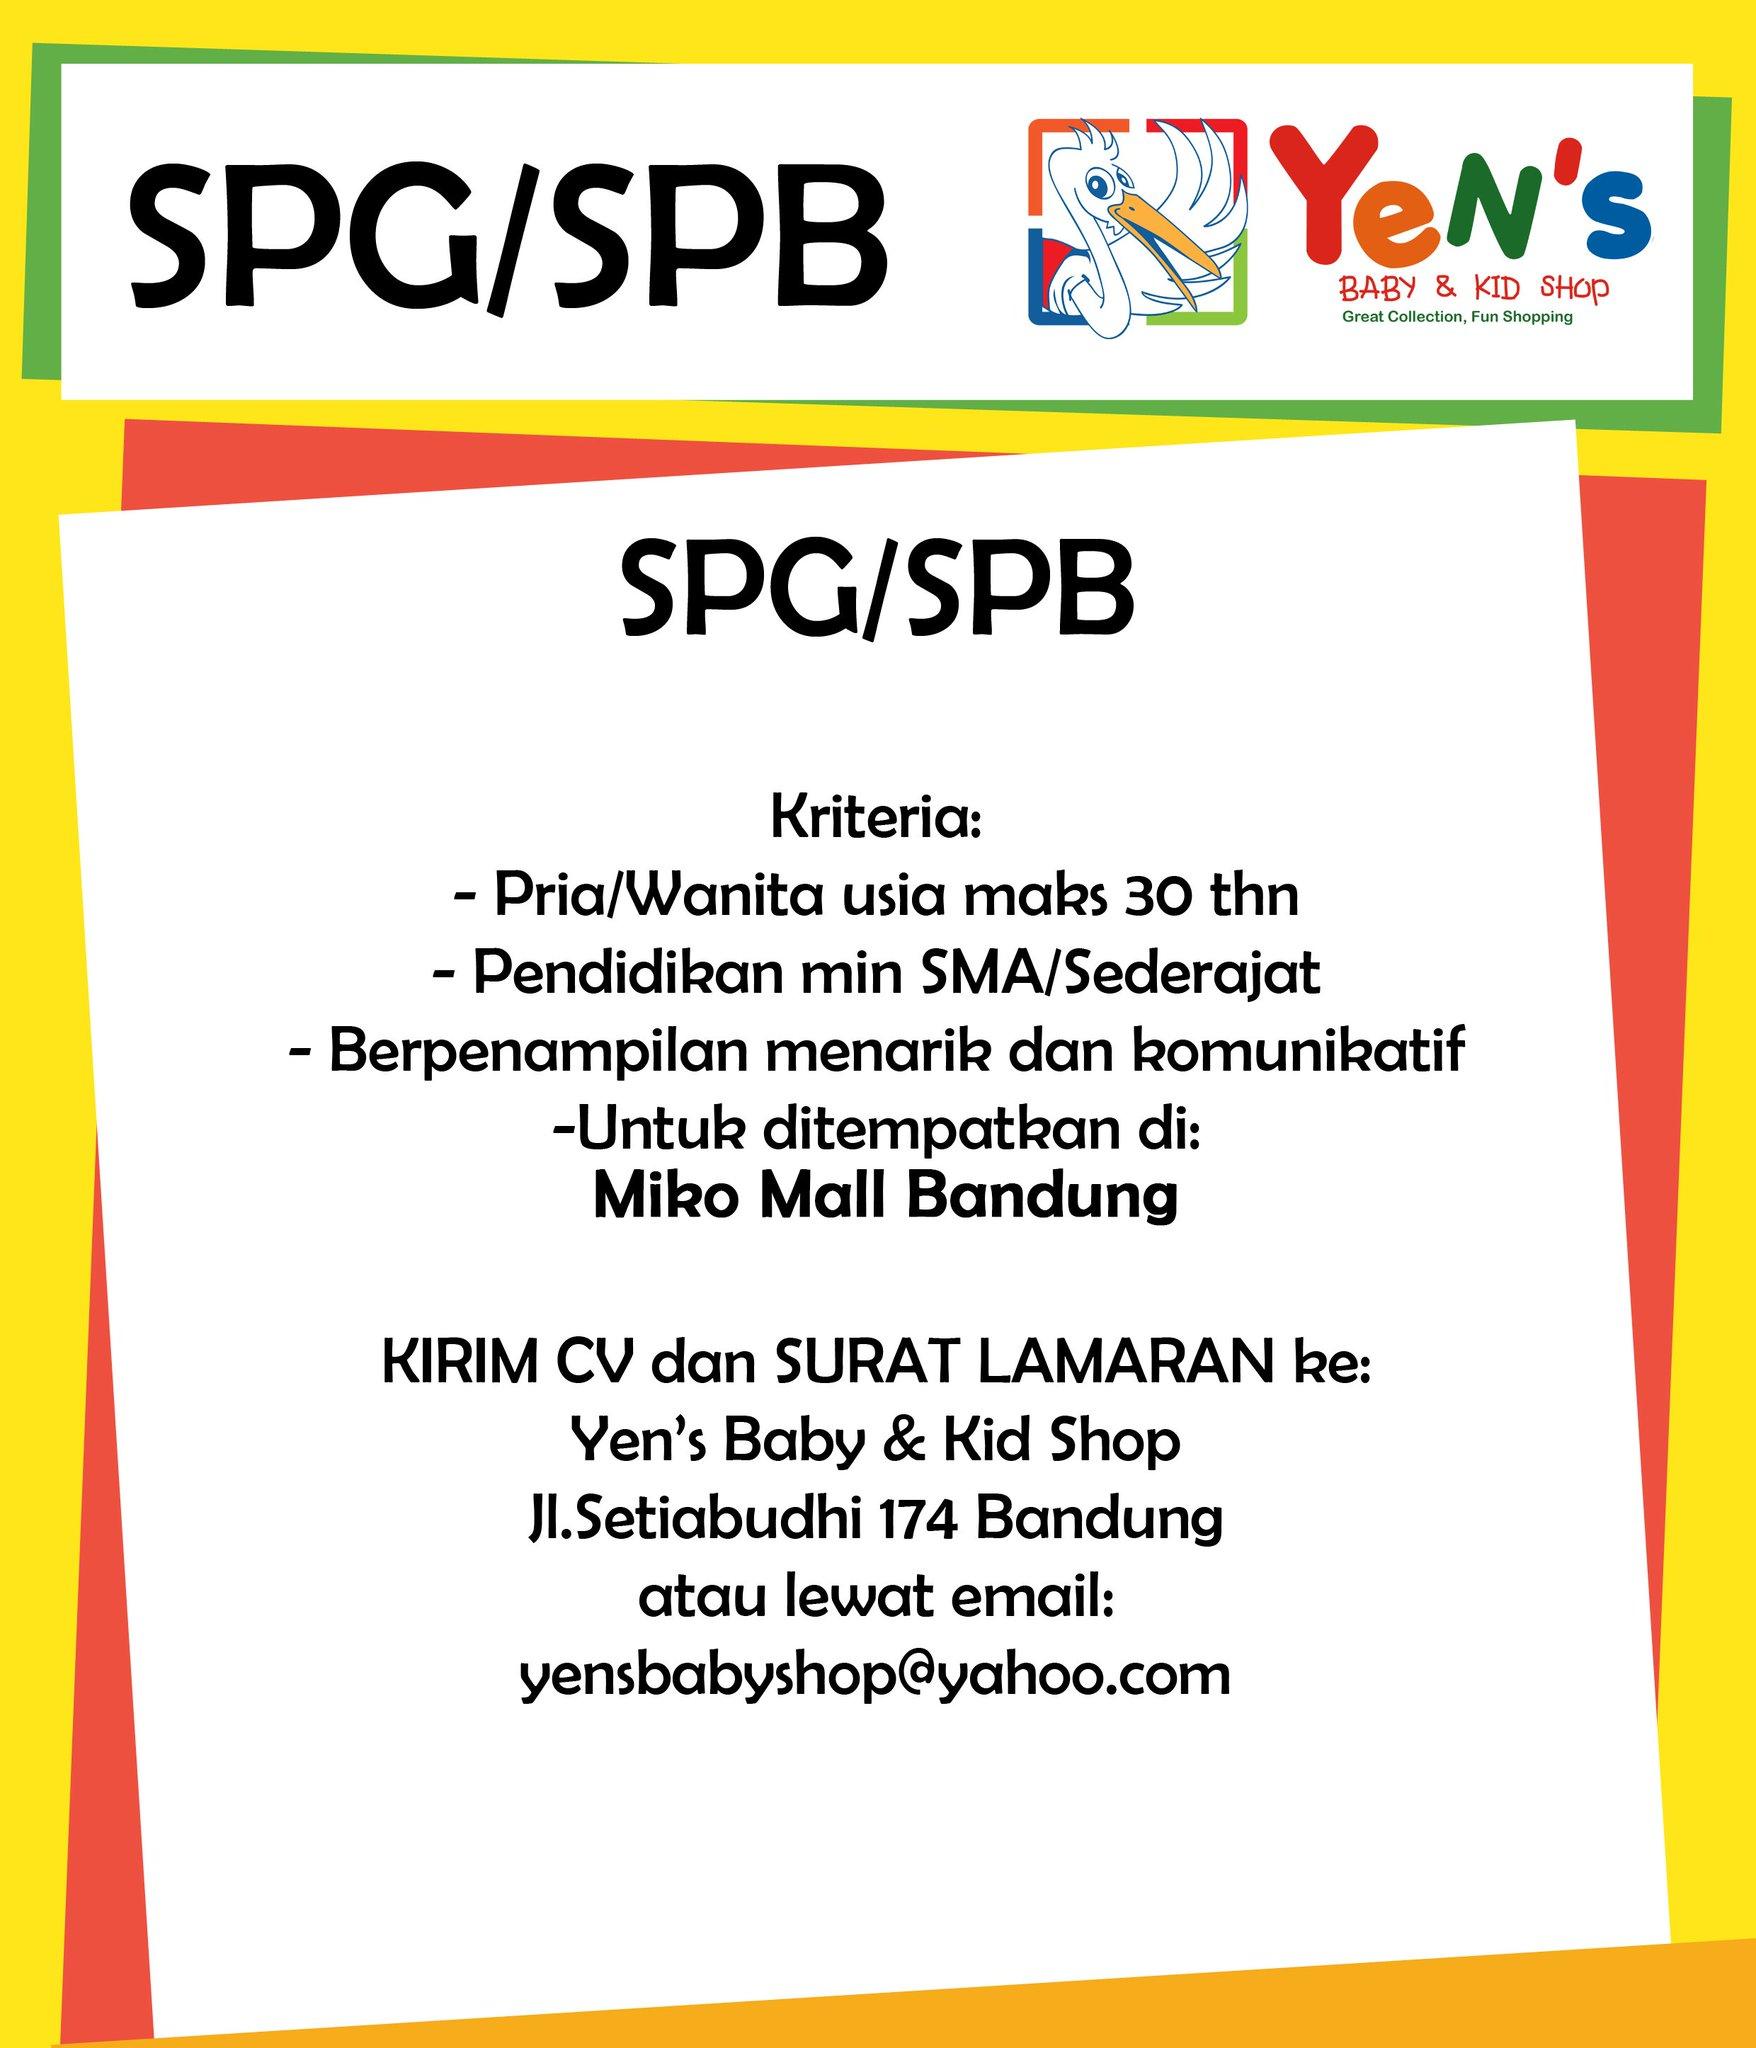 Yens Baby Kid Shop On Twitter Loker Spg Spb Lokerbdg Utk Ditempatkan Di Miko Mall Bandung Kirim Surat Lamaran Cv Ke Jl Setiabudhi 174 Https T Co 0bo8ntk0f6